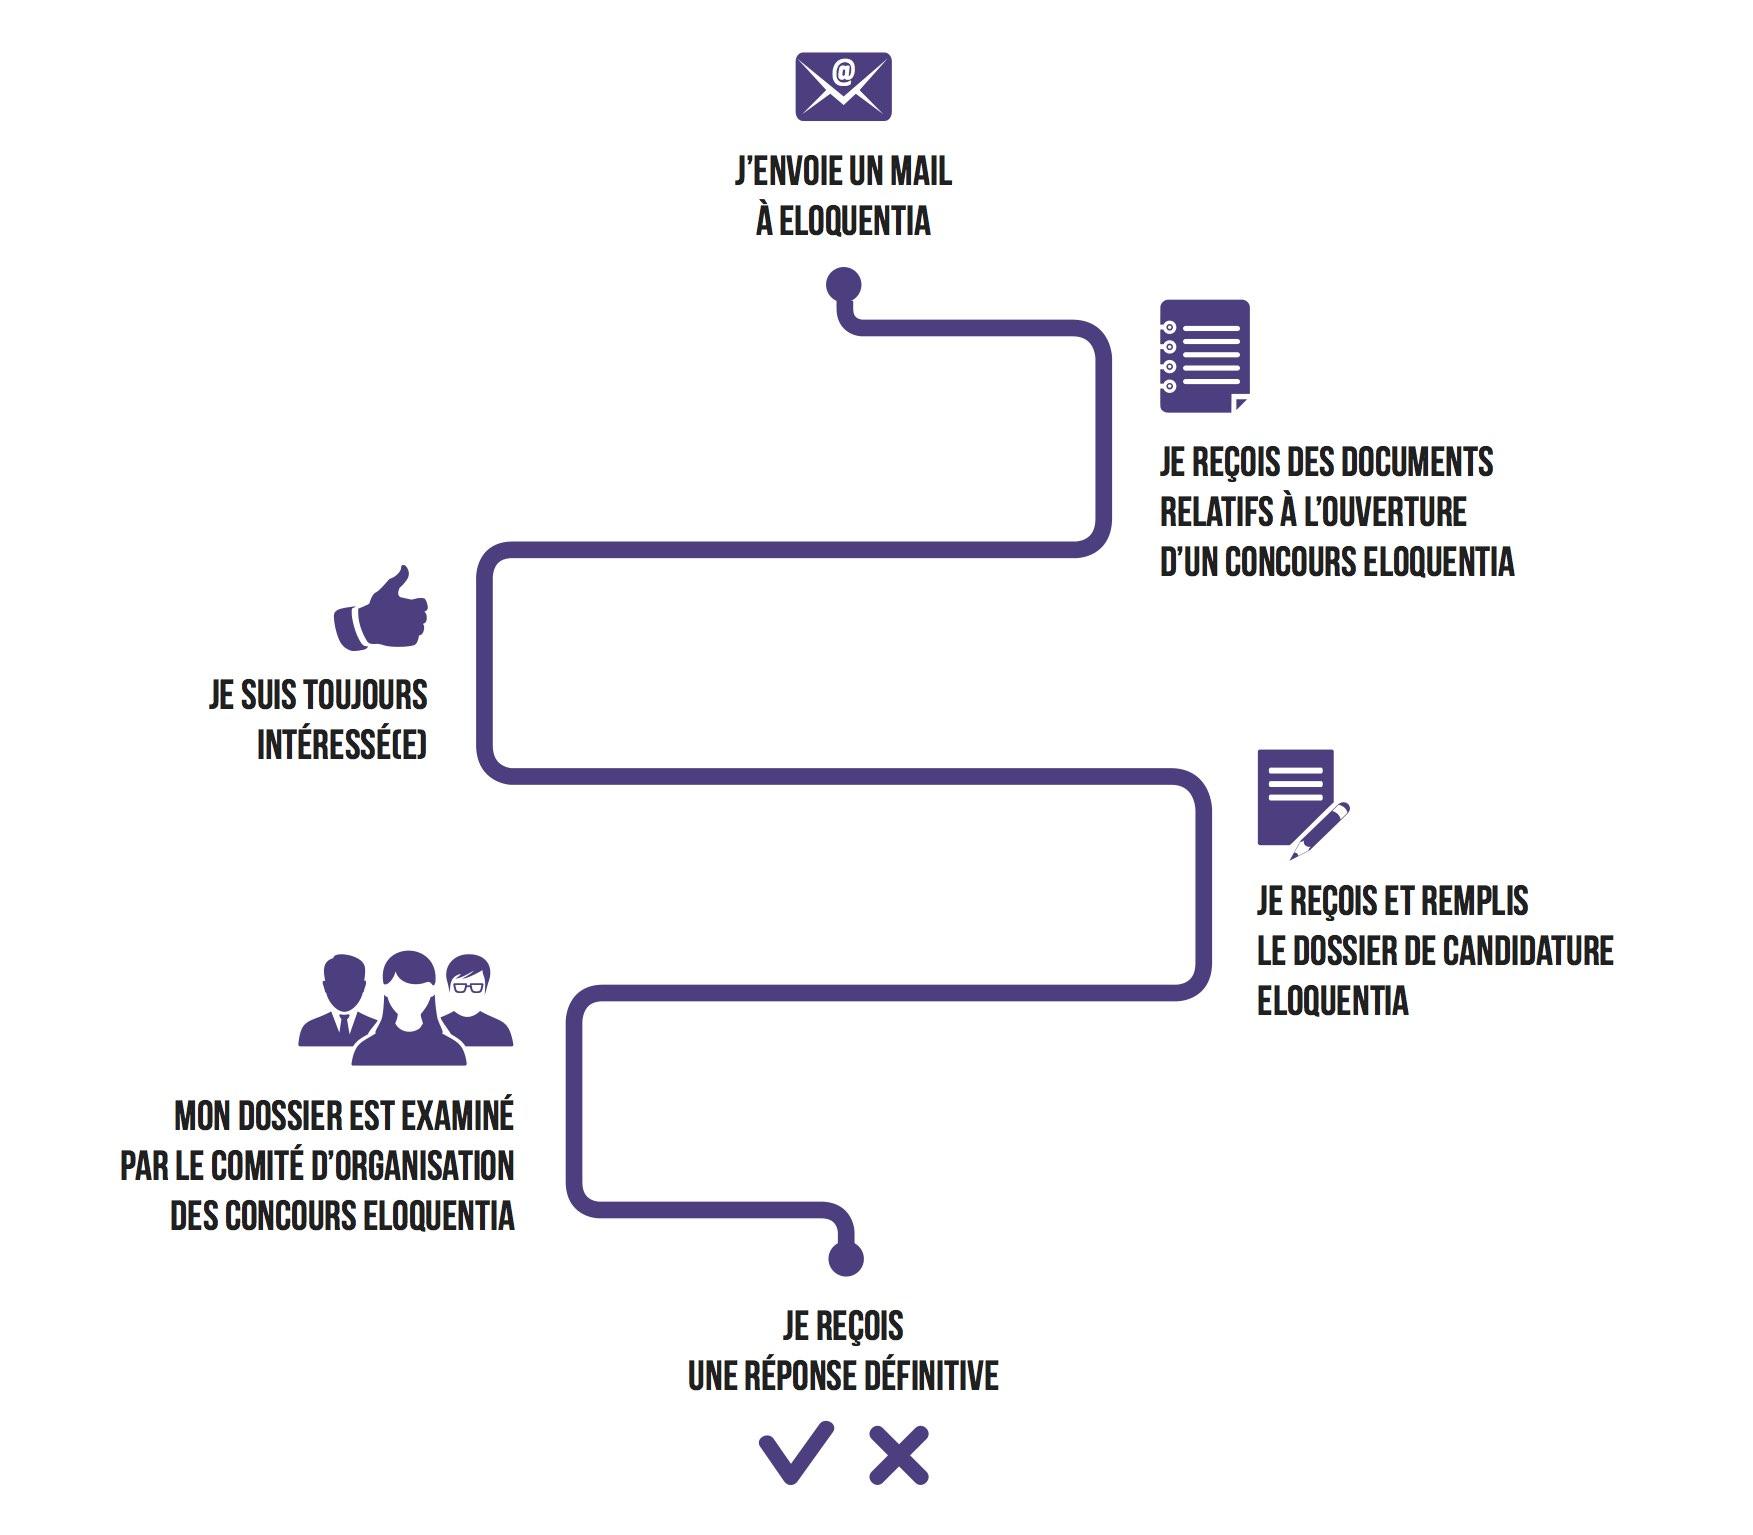 Schema de candidature Eloquentia